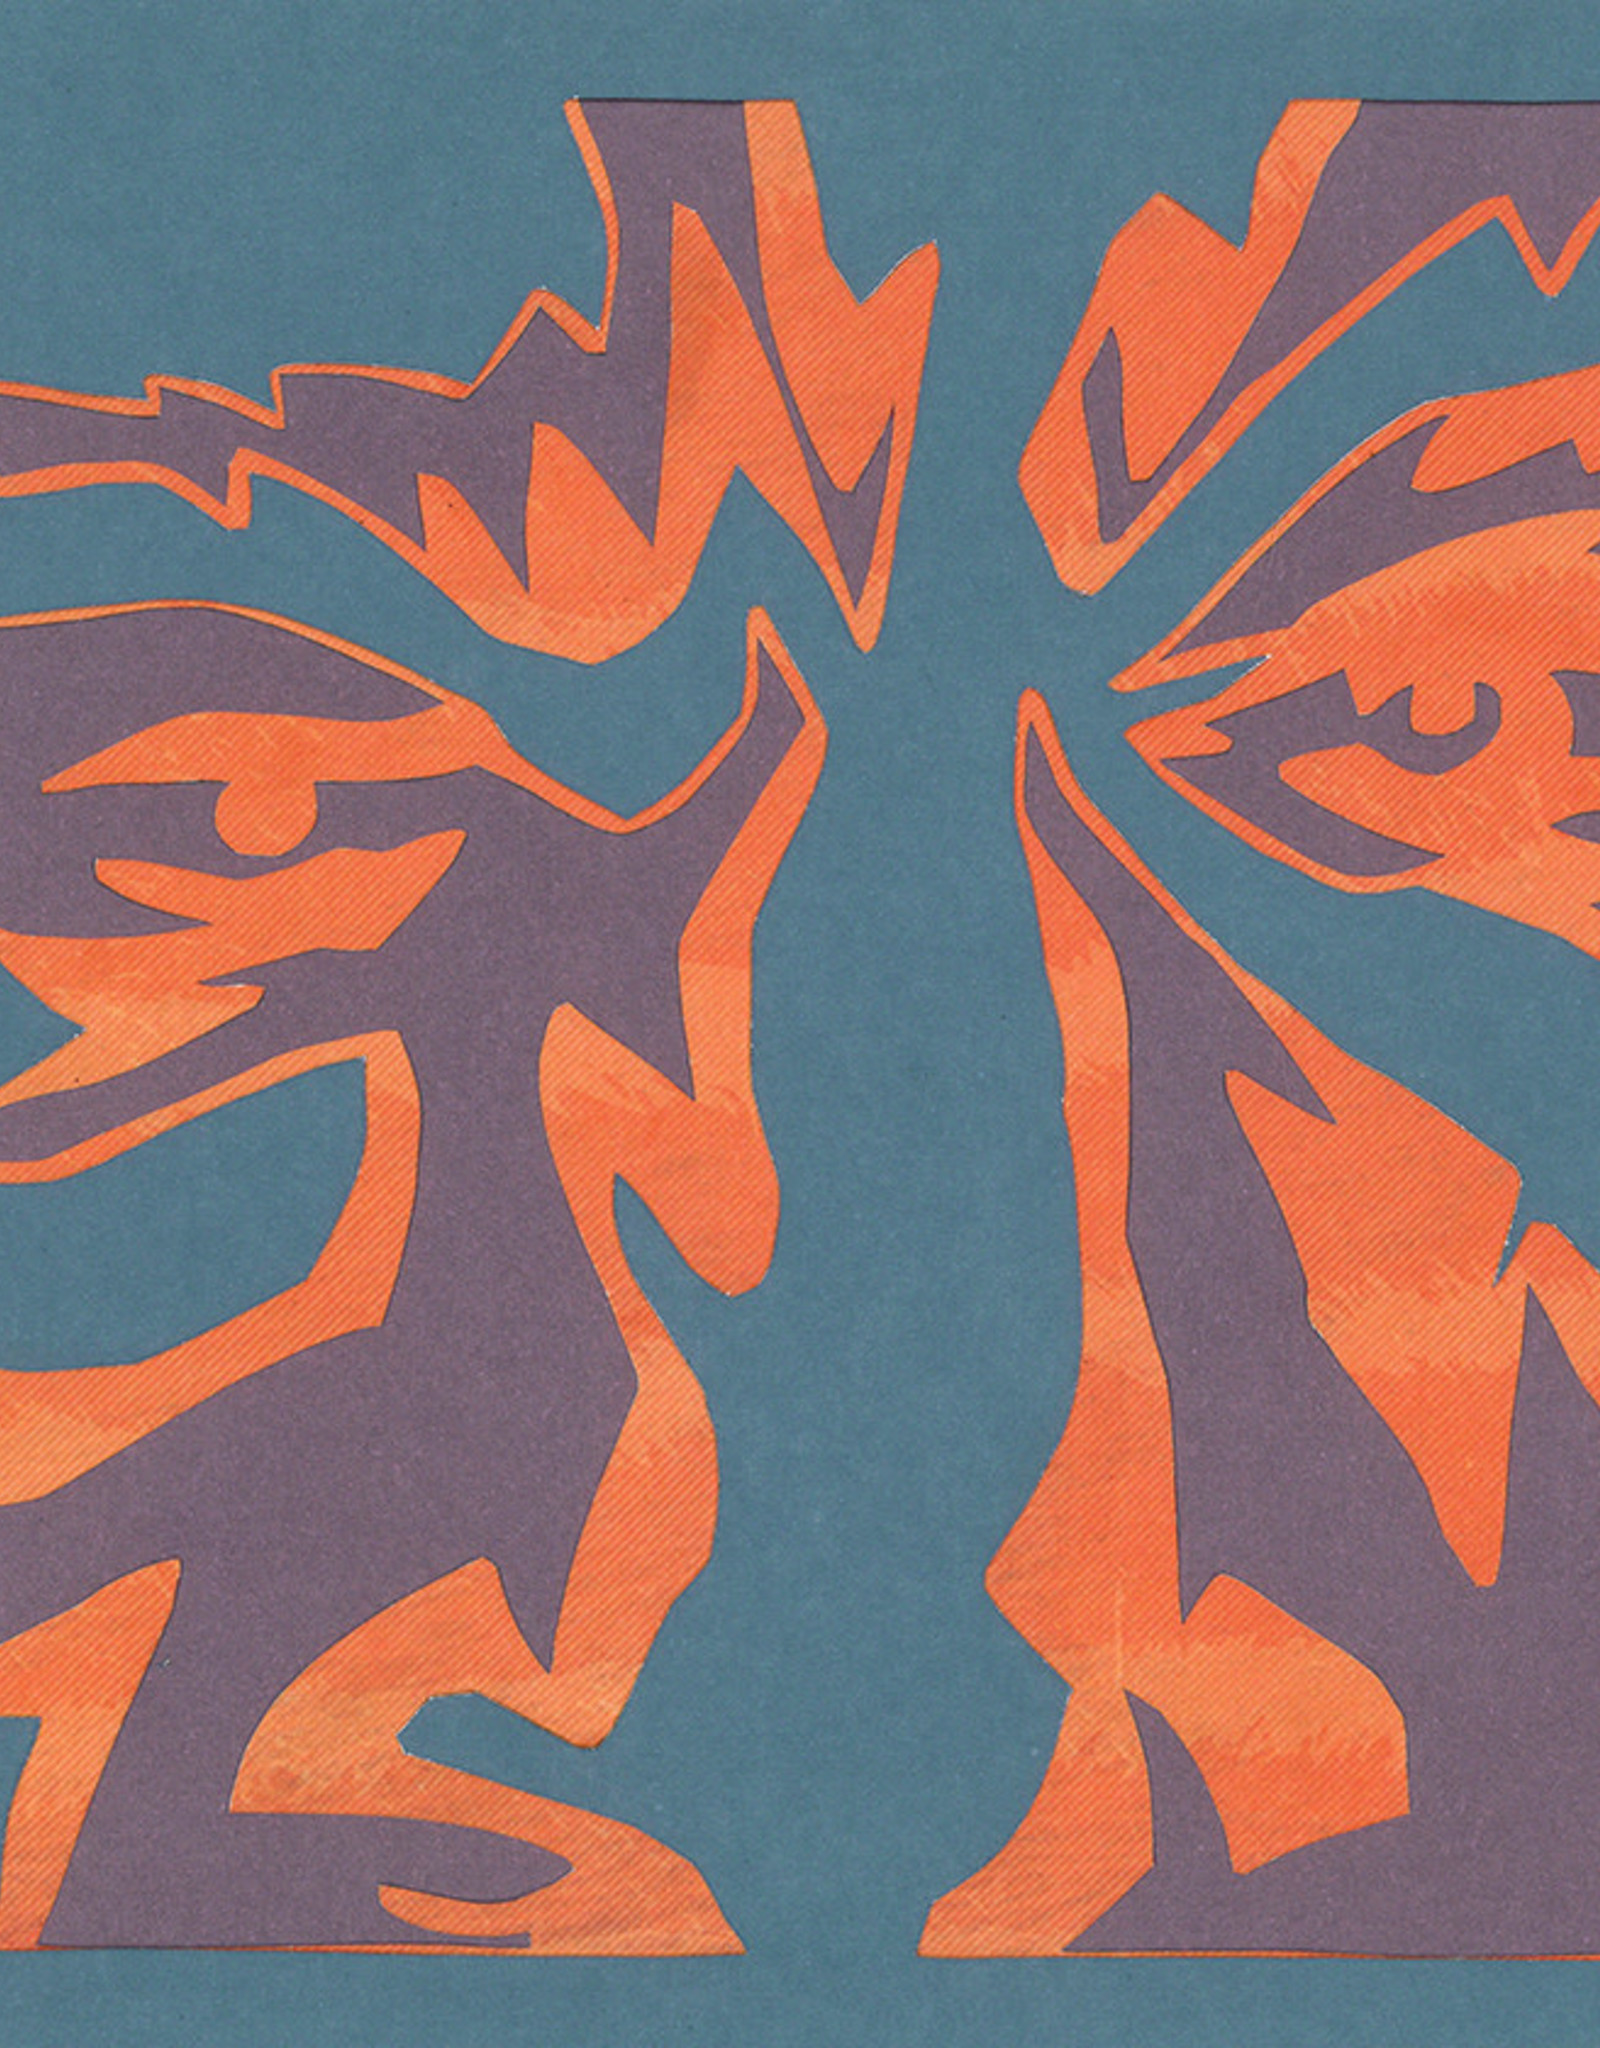 Gray Jones Face to Face -Cutout 9x12 #11